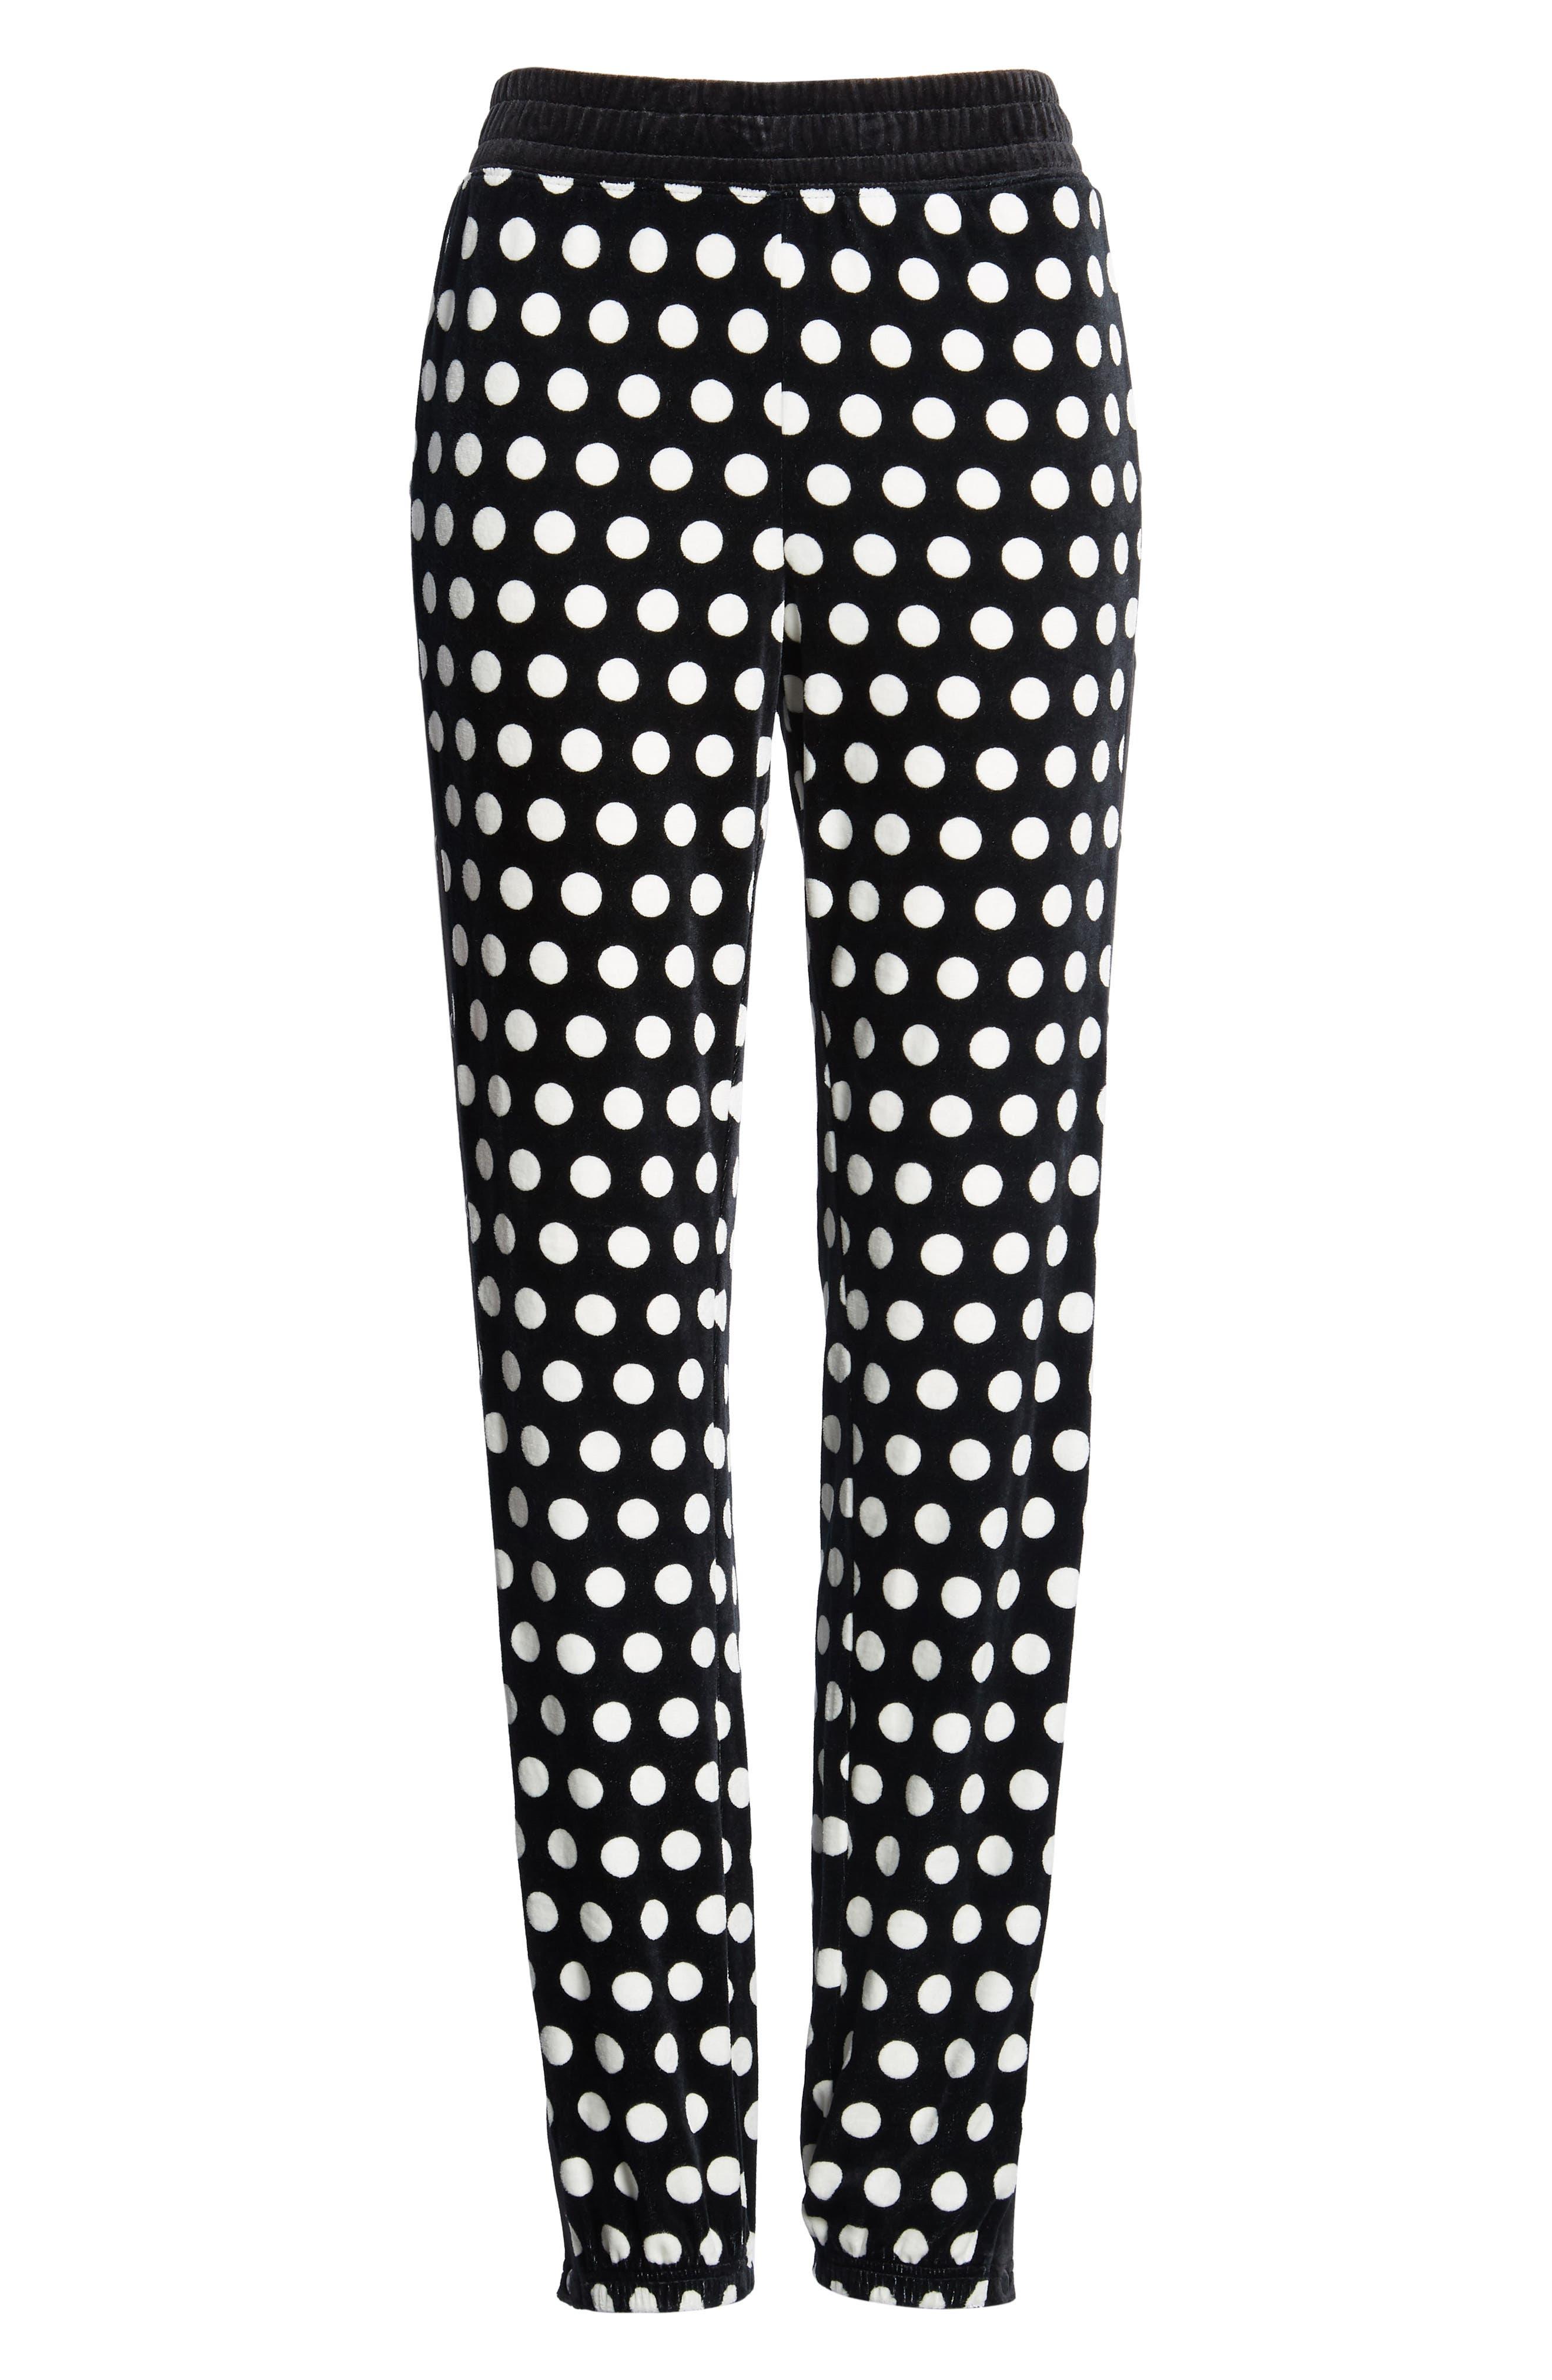 Polka Dot Velour Track Pants,                             Alternate thumbnail 7, color,                             Pitch Black St. Germain Dot